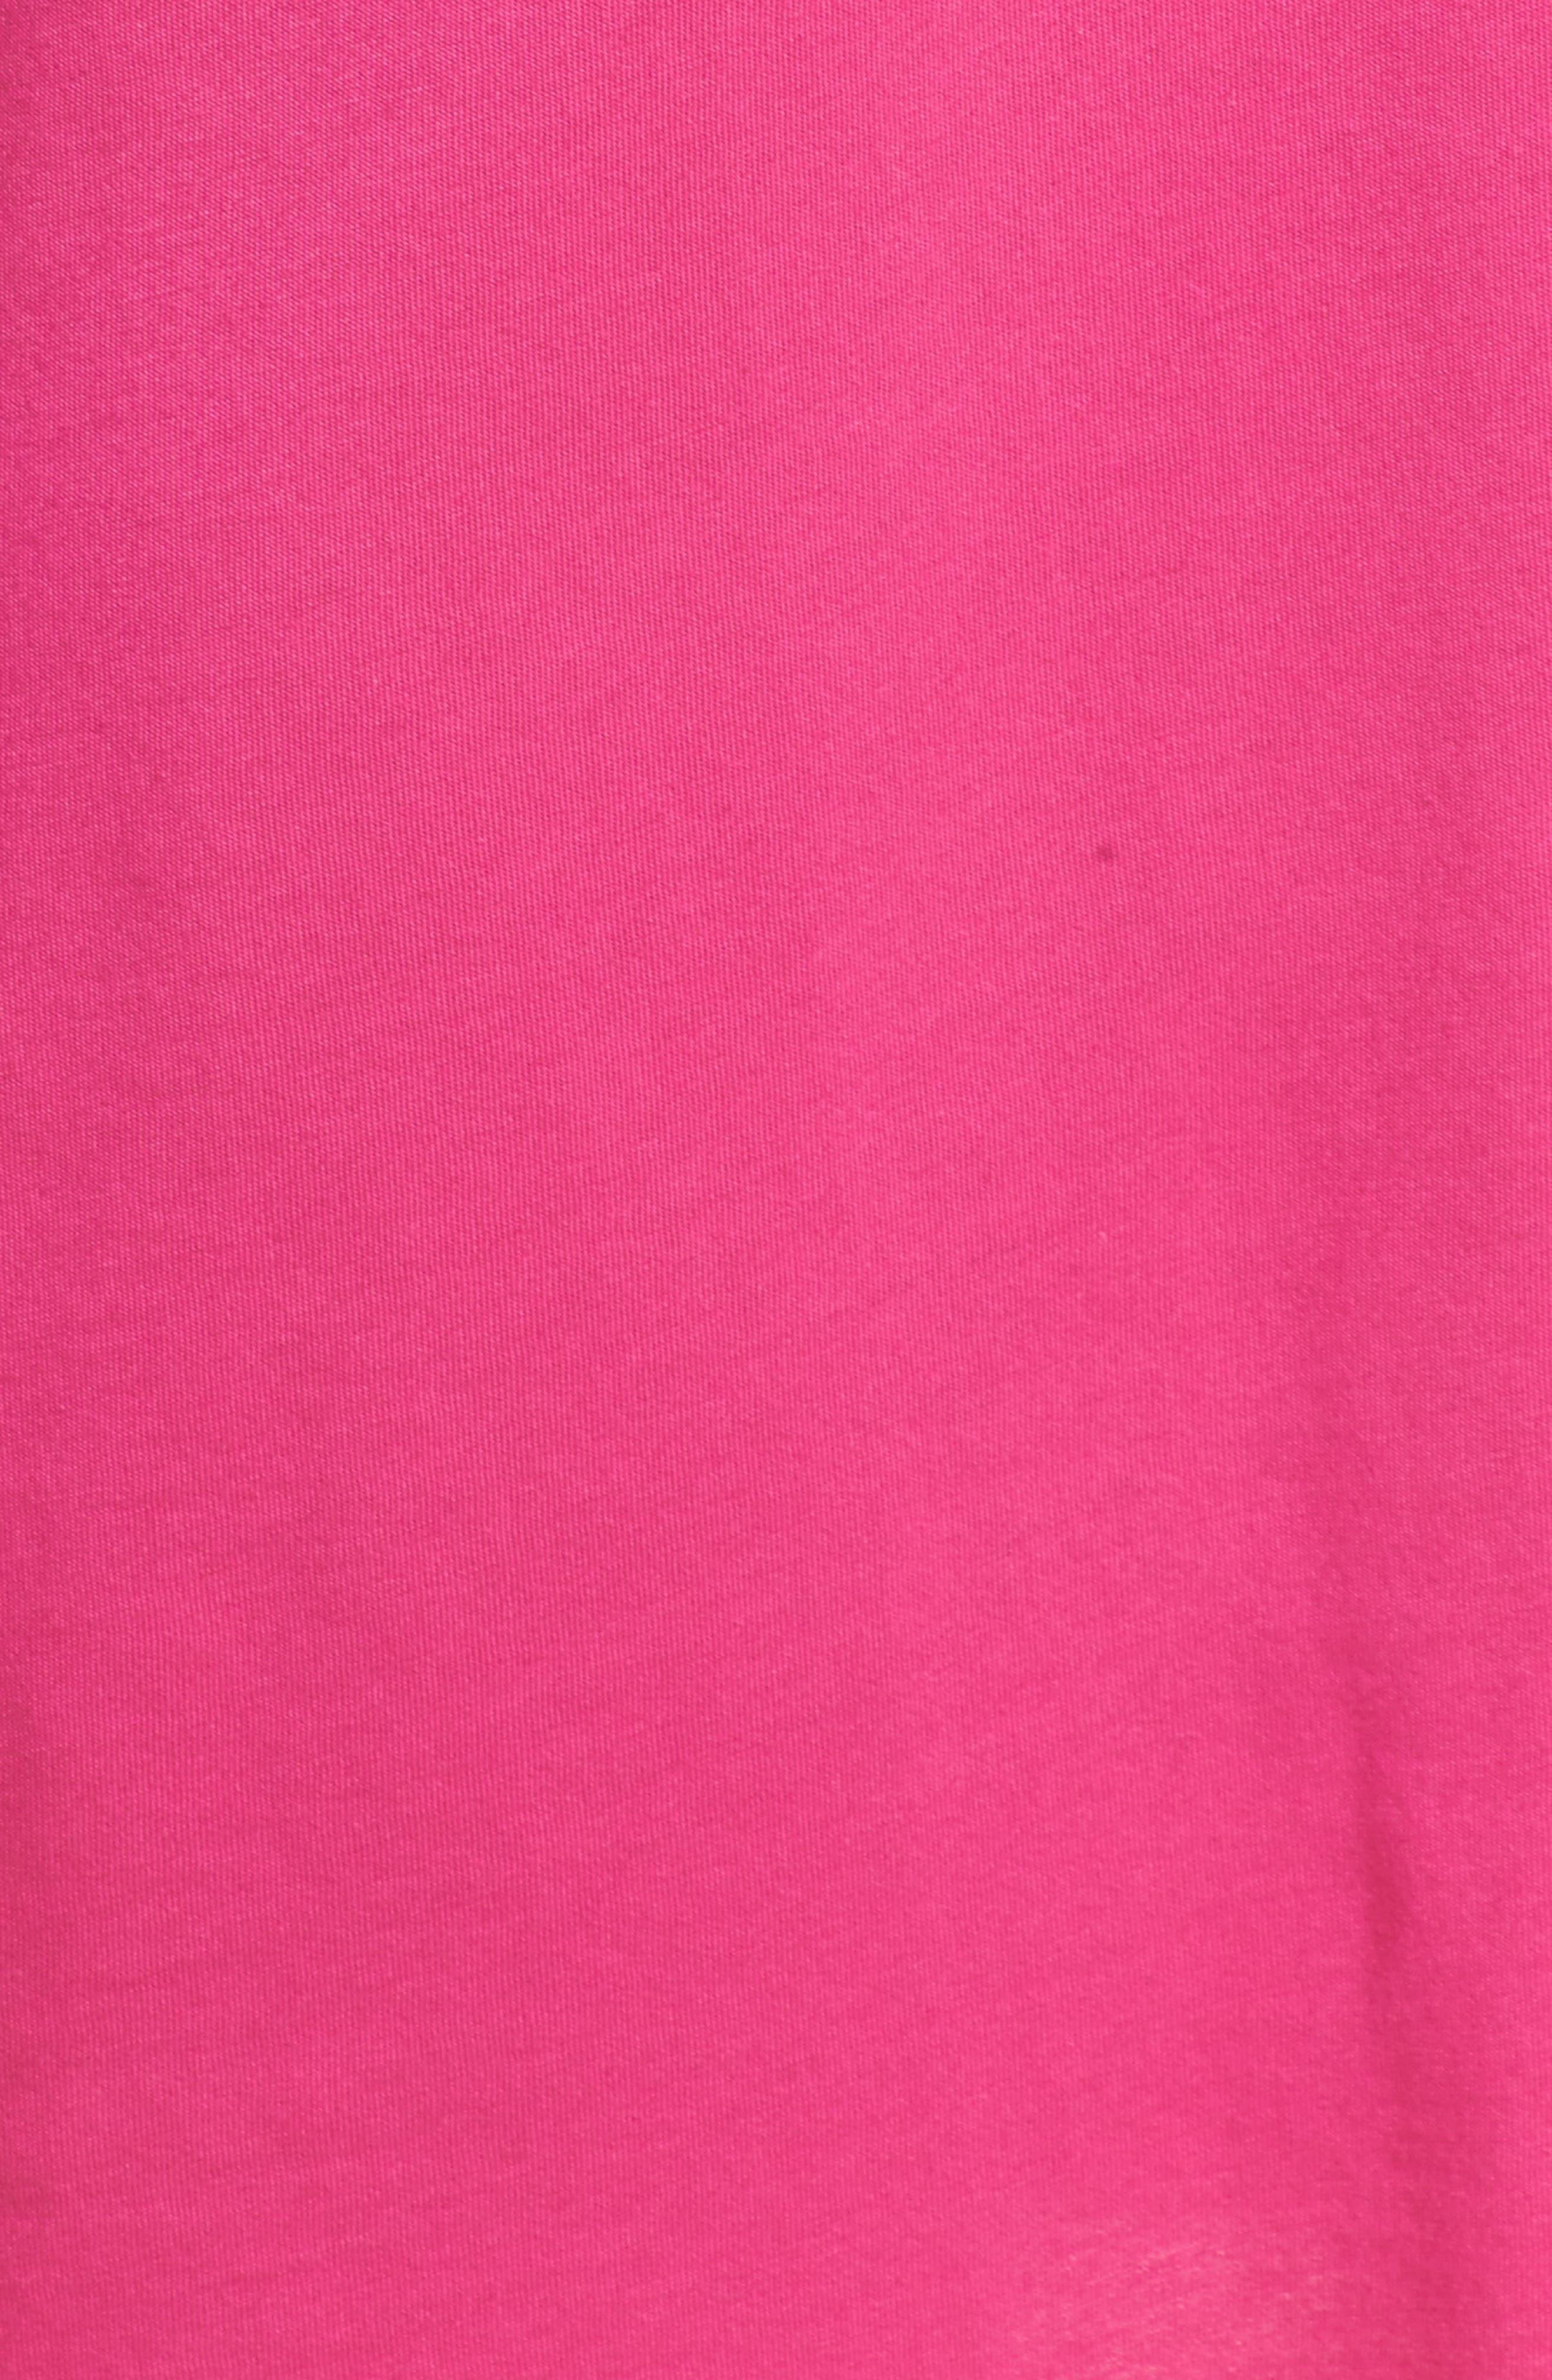 Alternate Image 5  - Lauren Ralph Lauren Knit Nightshirt (Online Only)